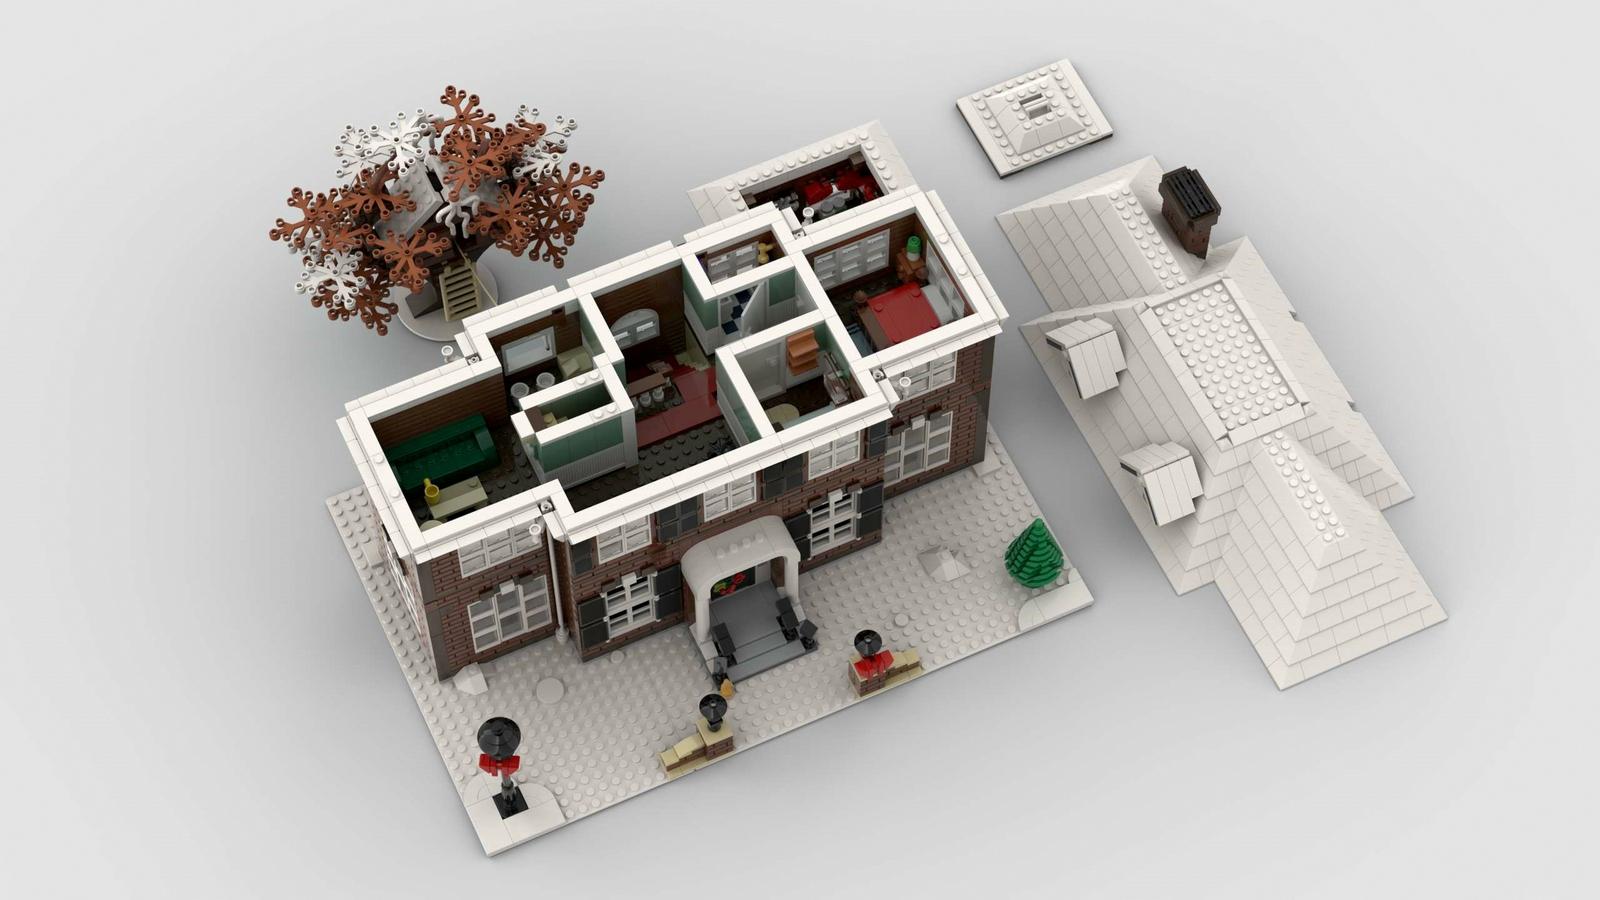 lego-ideas-home-alone-dach-adwind zusammengebaut.com